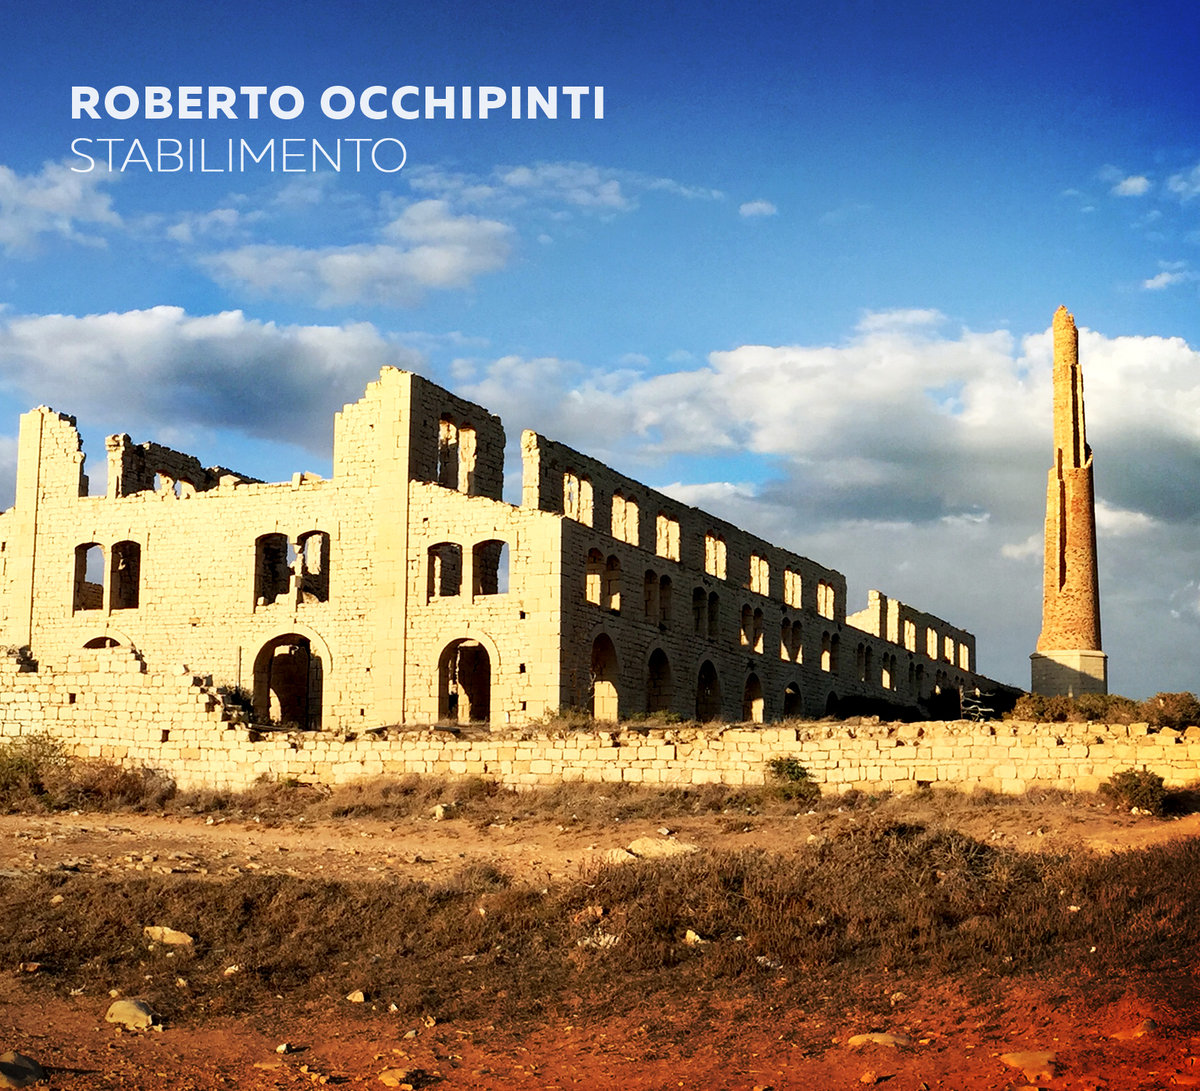 Roberto Occhipinti Stabilimento.jpg